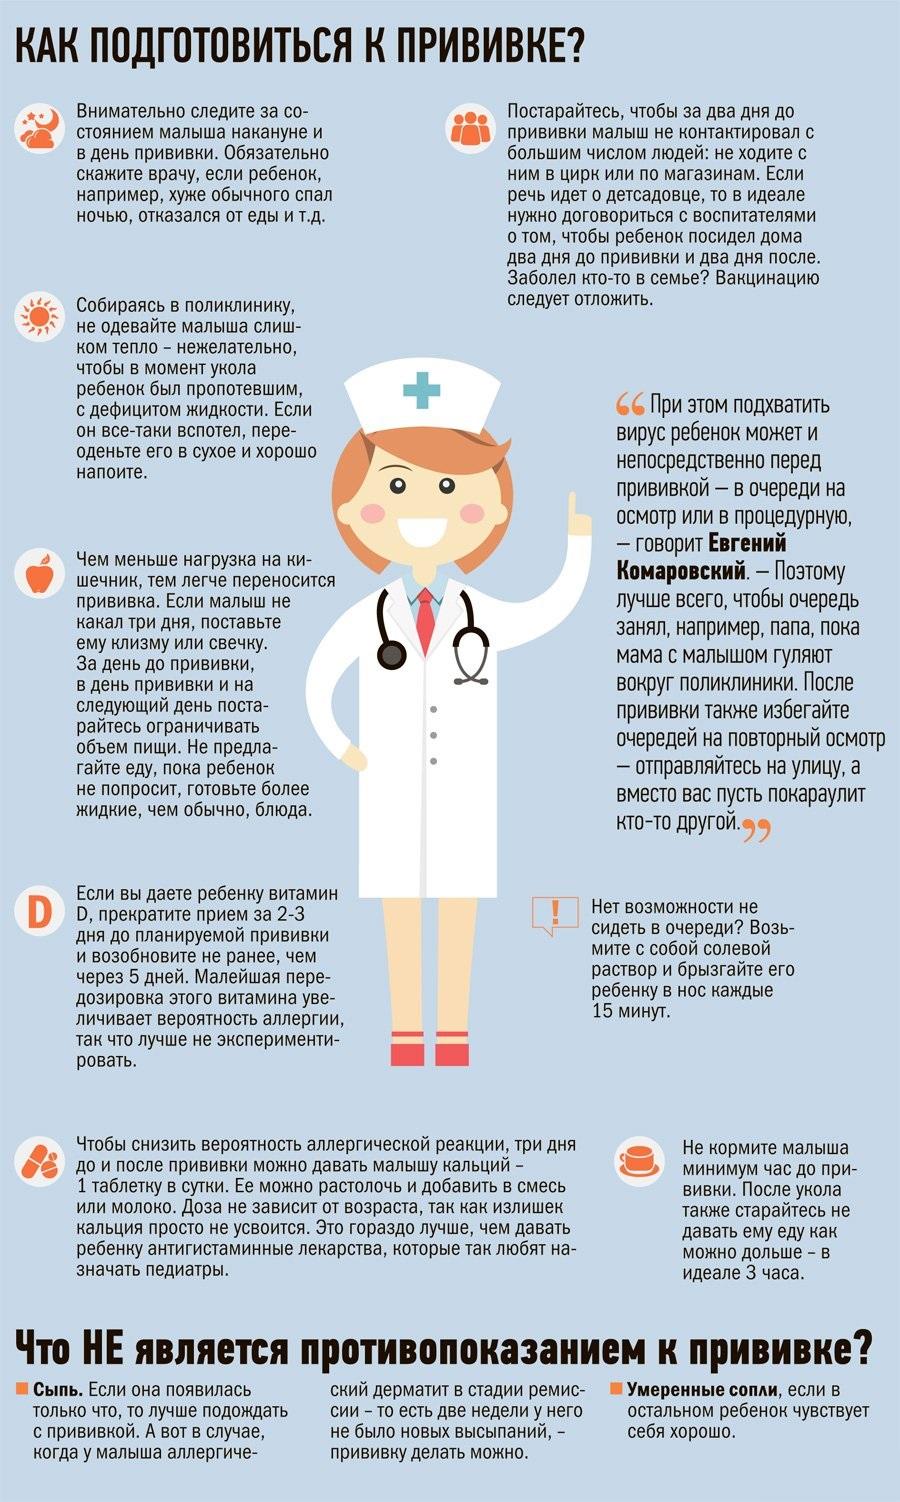 правила подготовки ребенка к прививке